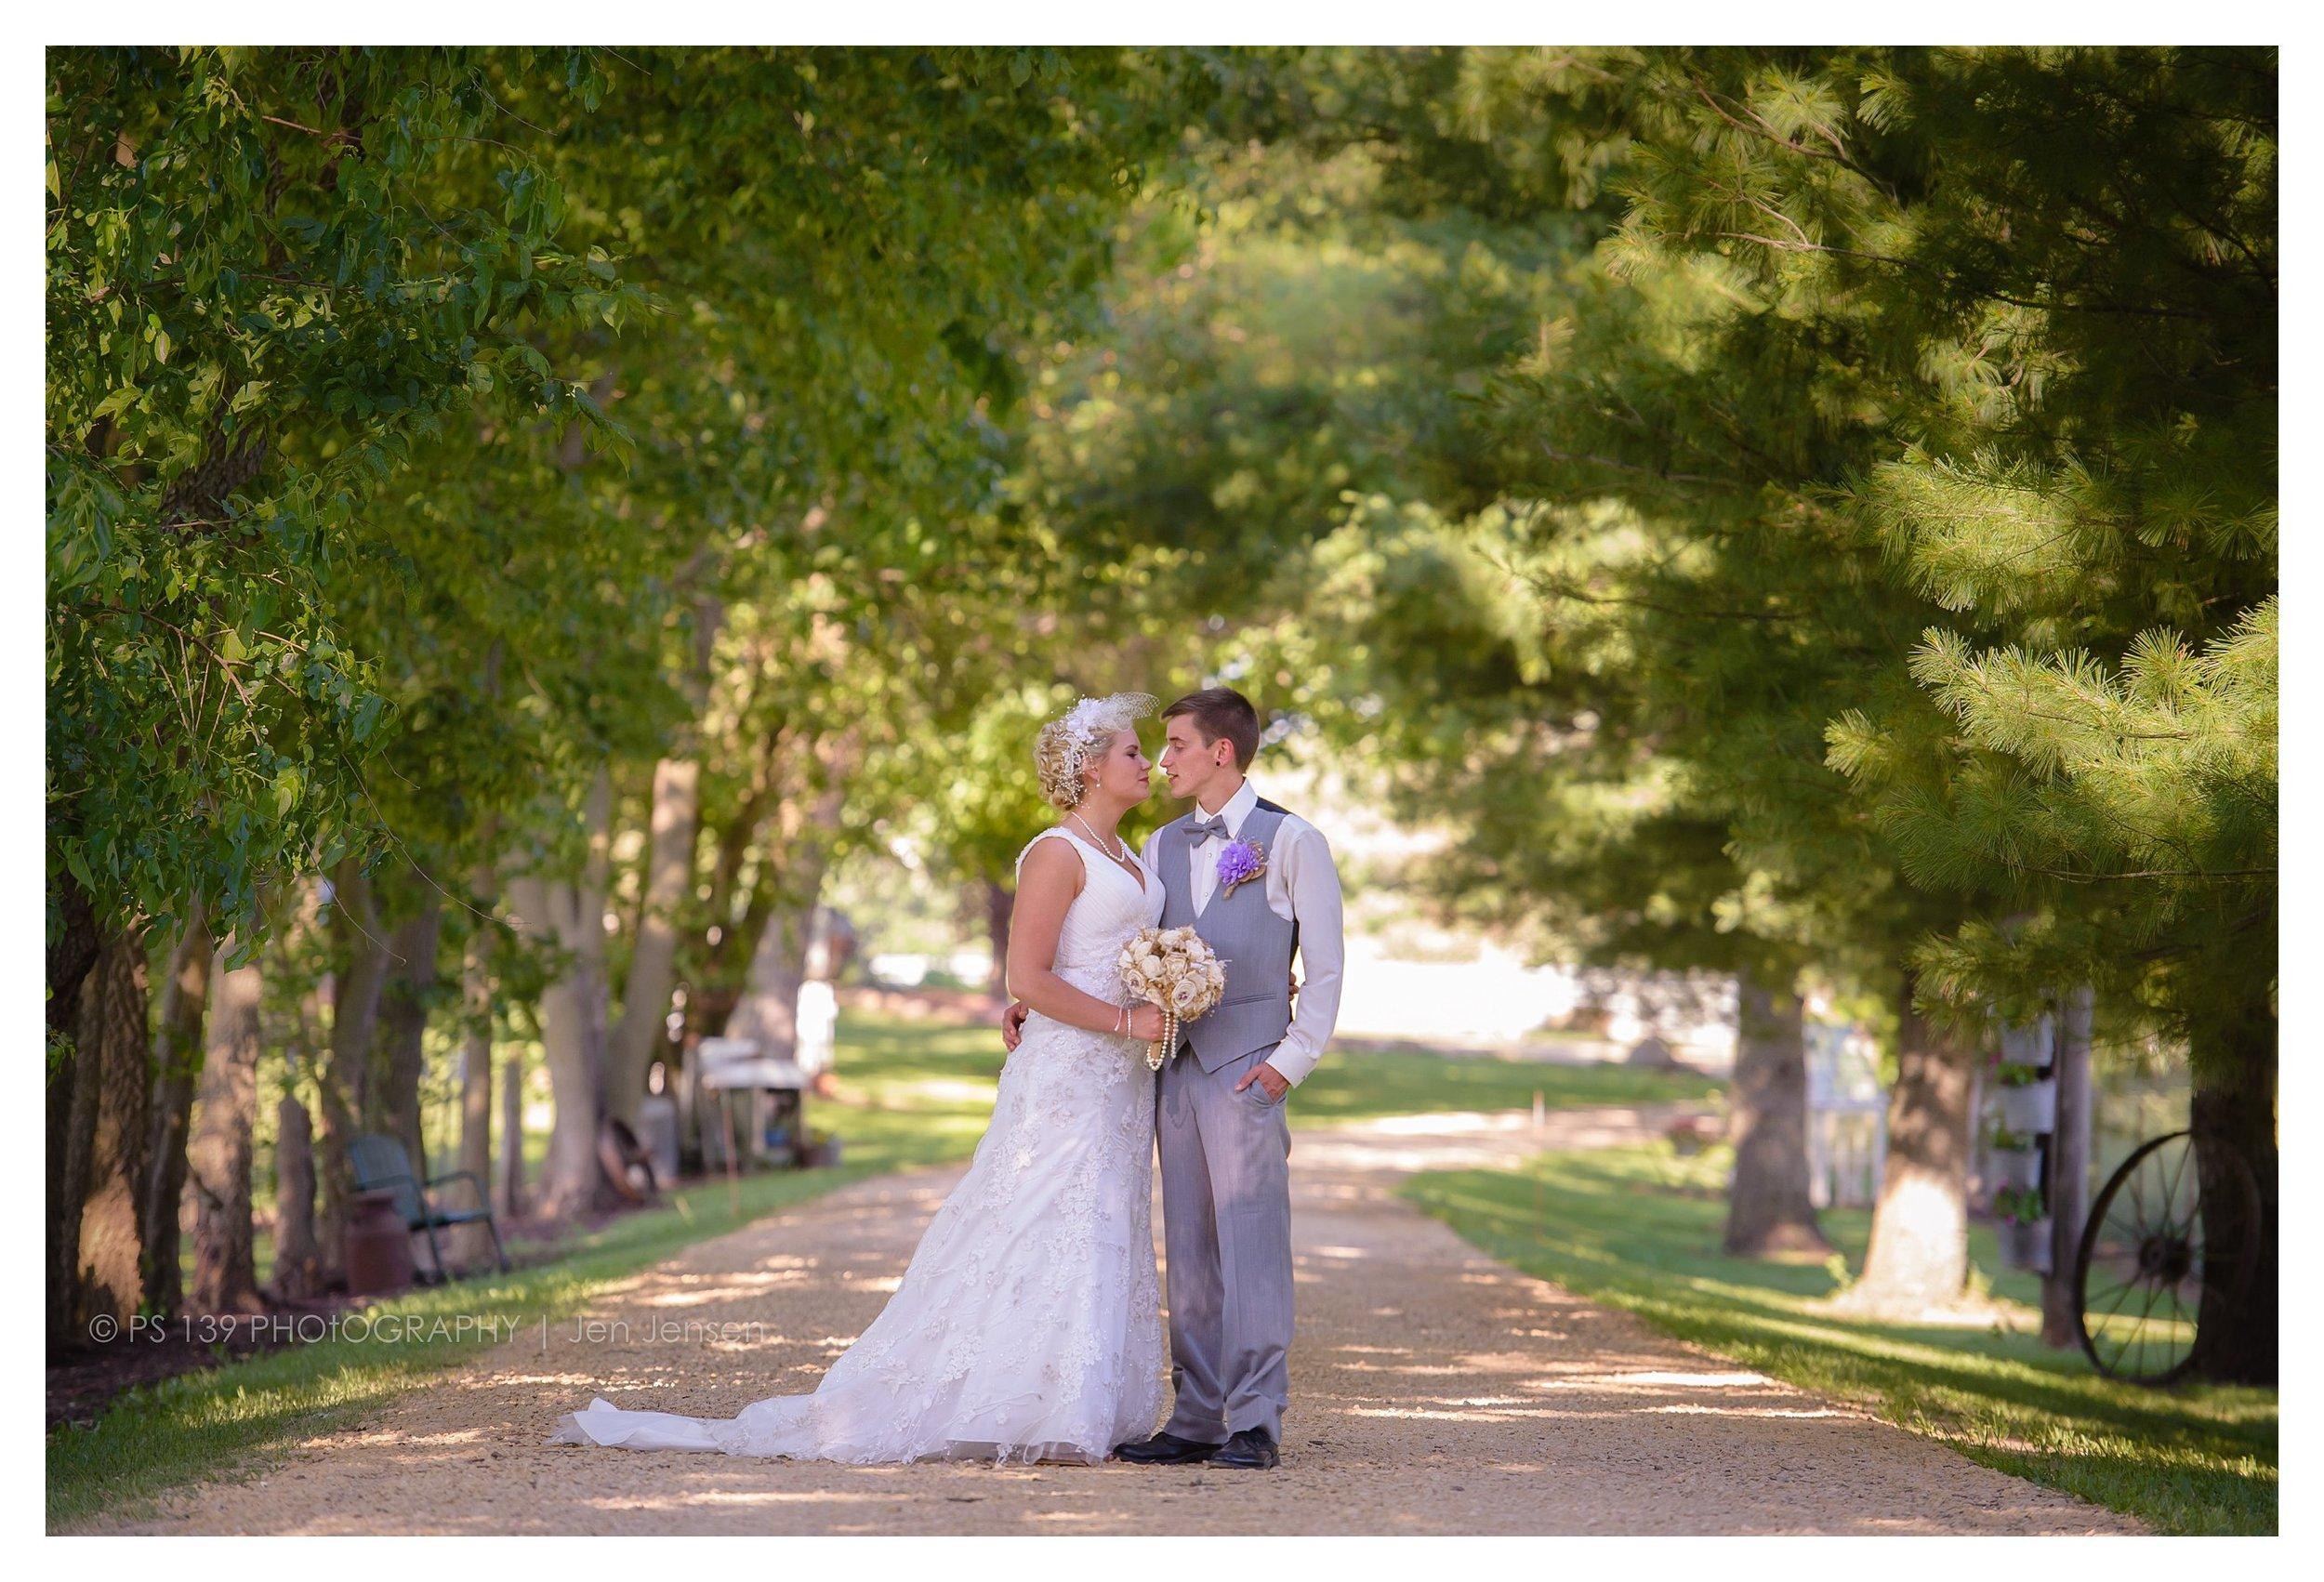 oregon Illinois oak lane farm wisconsin wedding photographer bayfield wi ps 139 photography jen jensen_0231.jpg